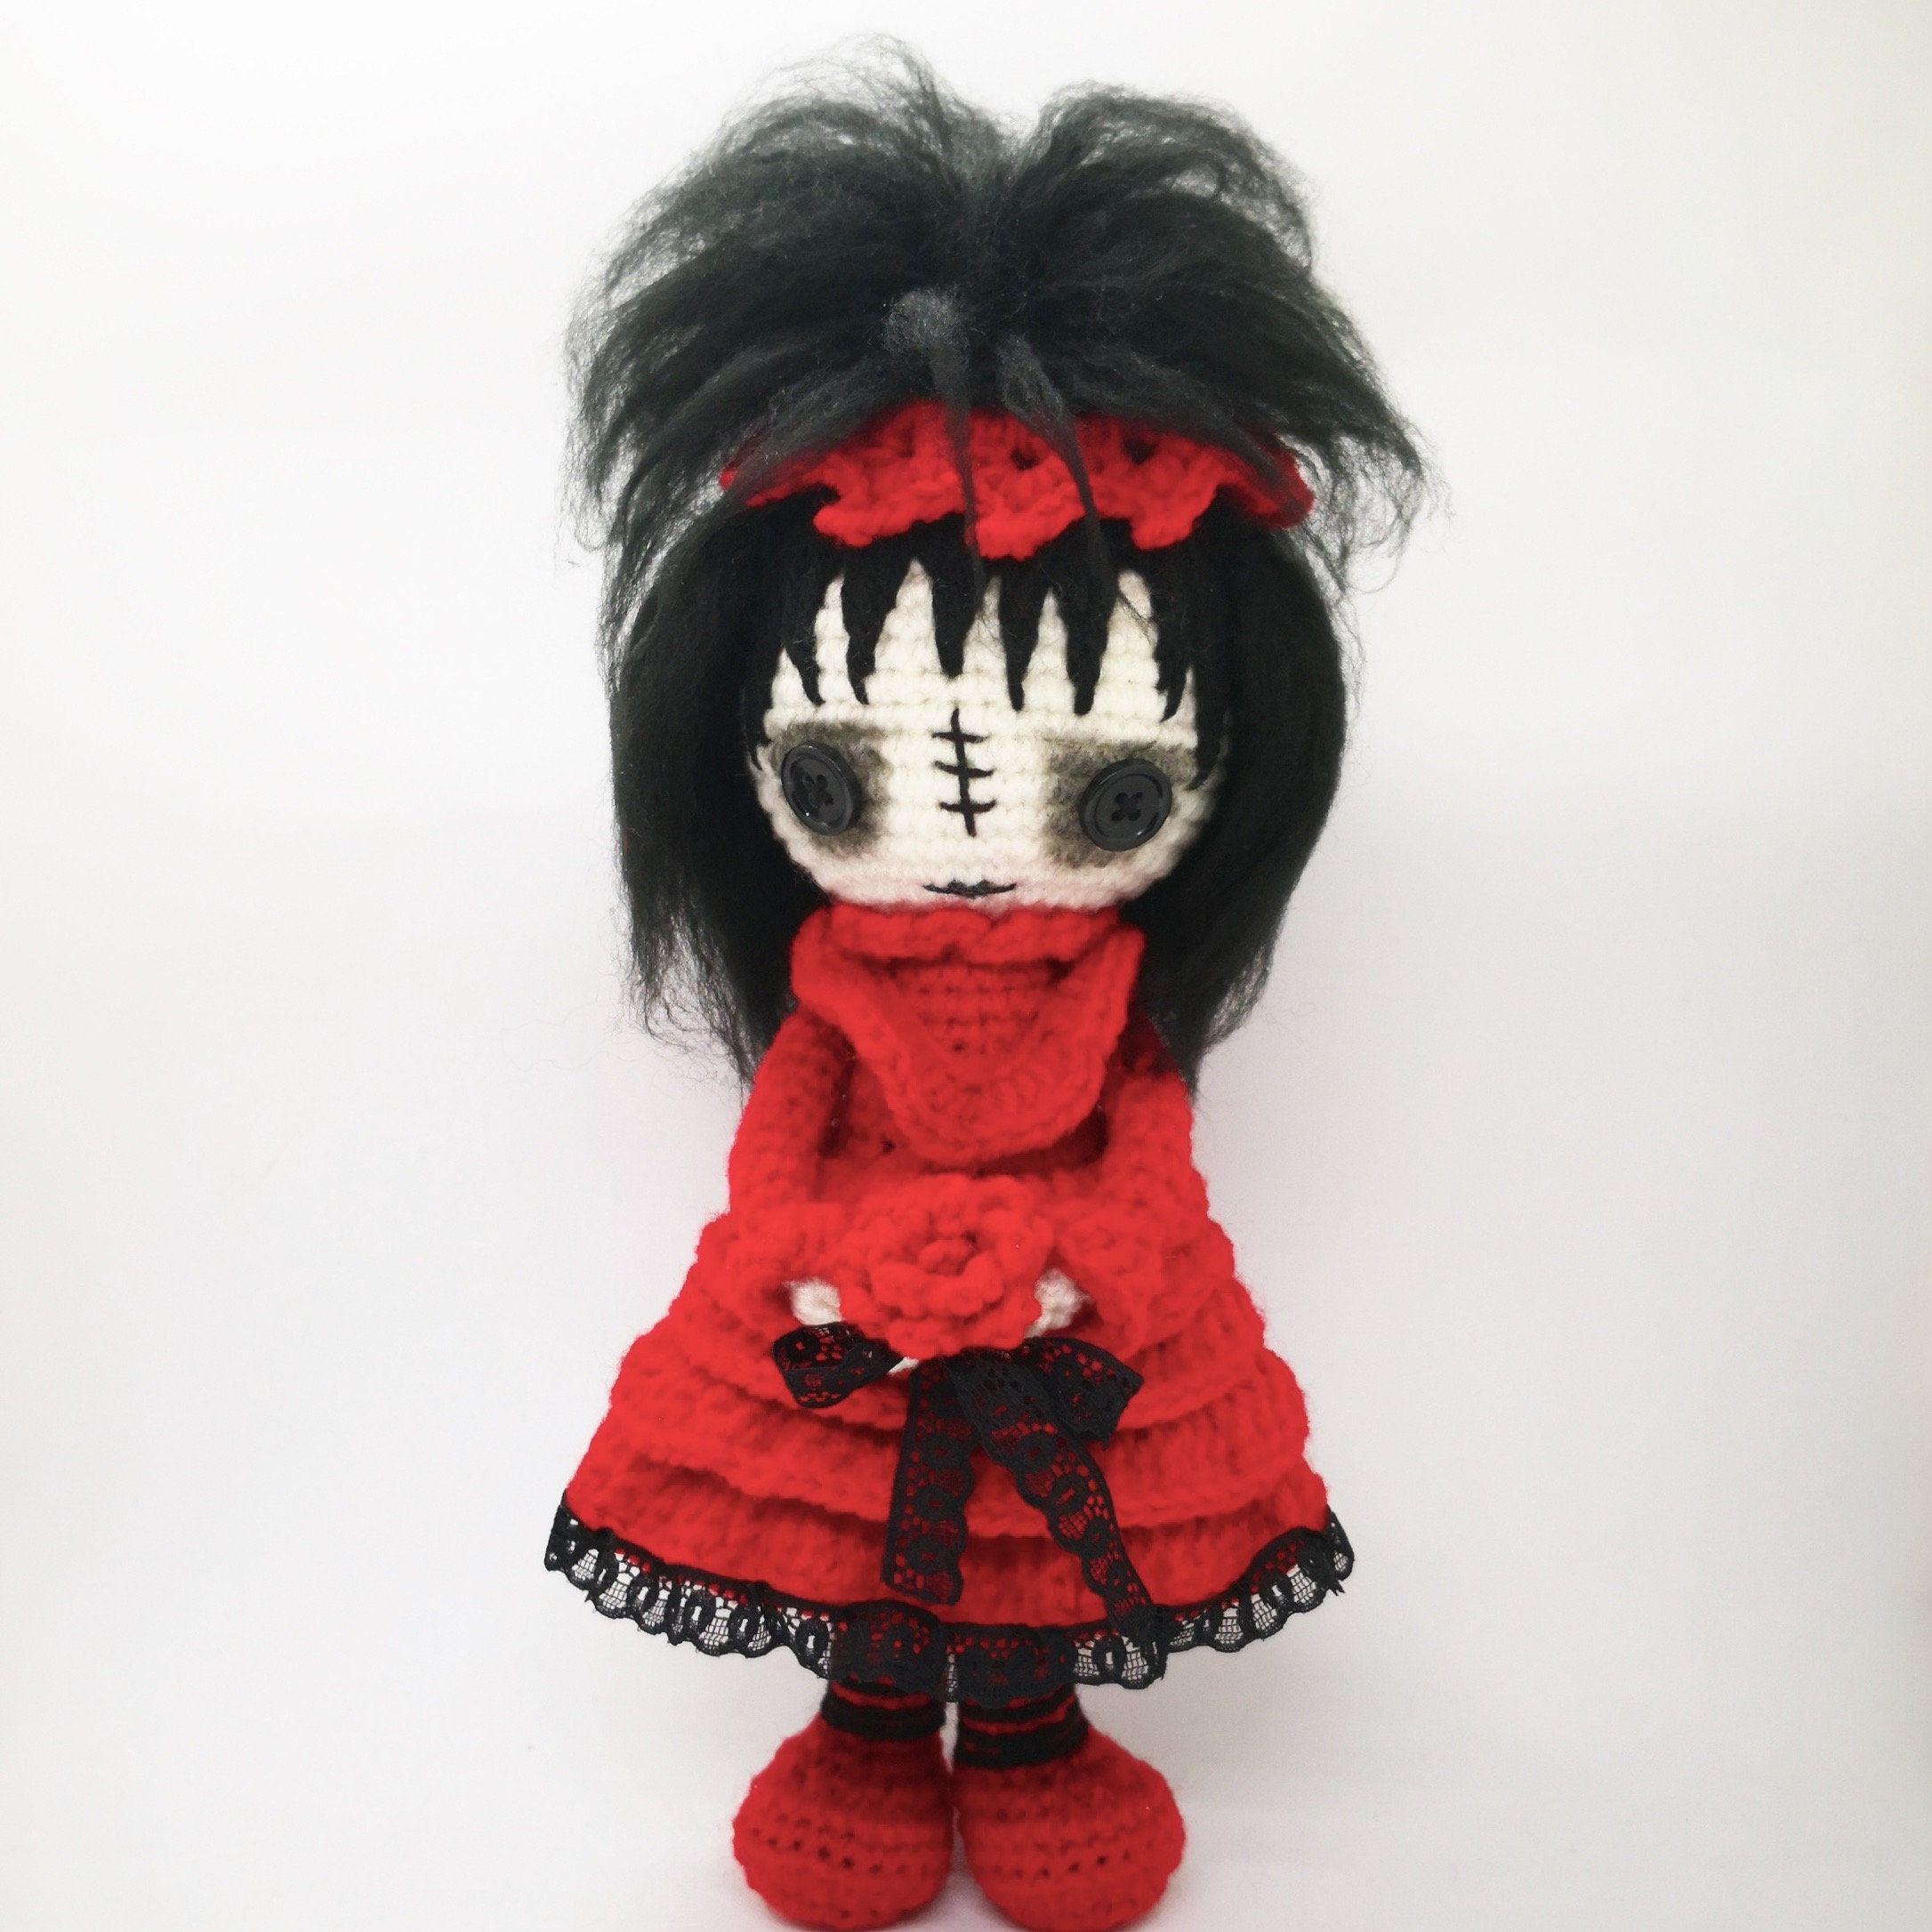 CROCHET PATTERN Lydia Deetz doll, whimsical creatures, Amigurumi Beetlejuice, Creepy cute amigurumi crochet doll, crochet pattern goth doll